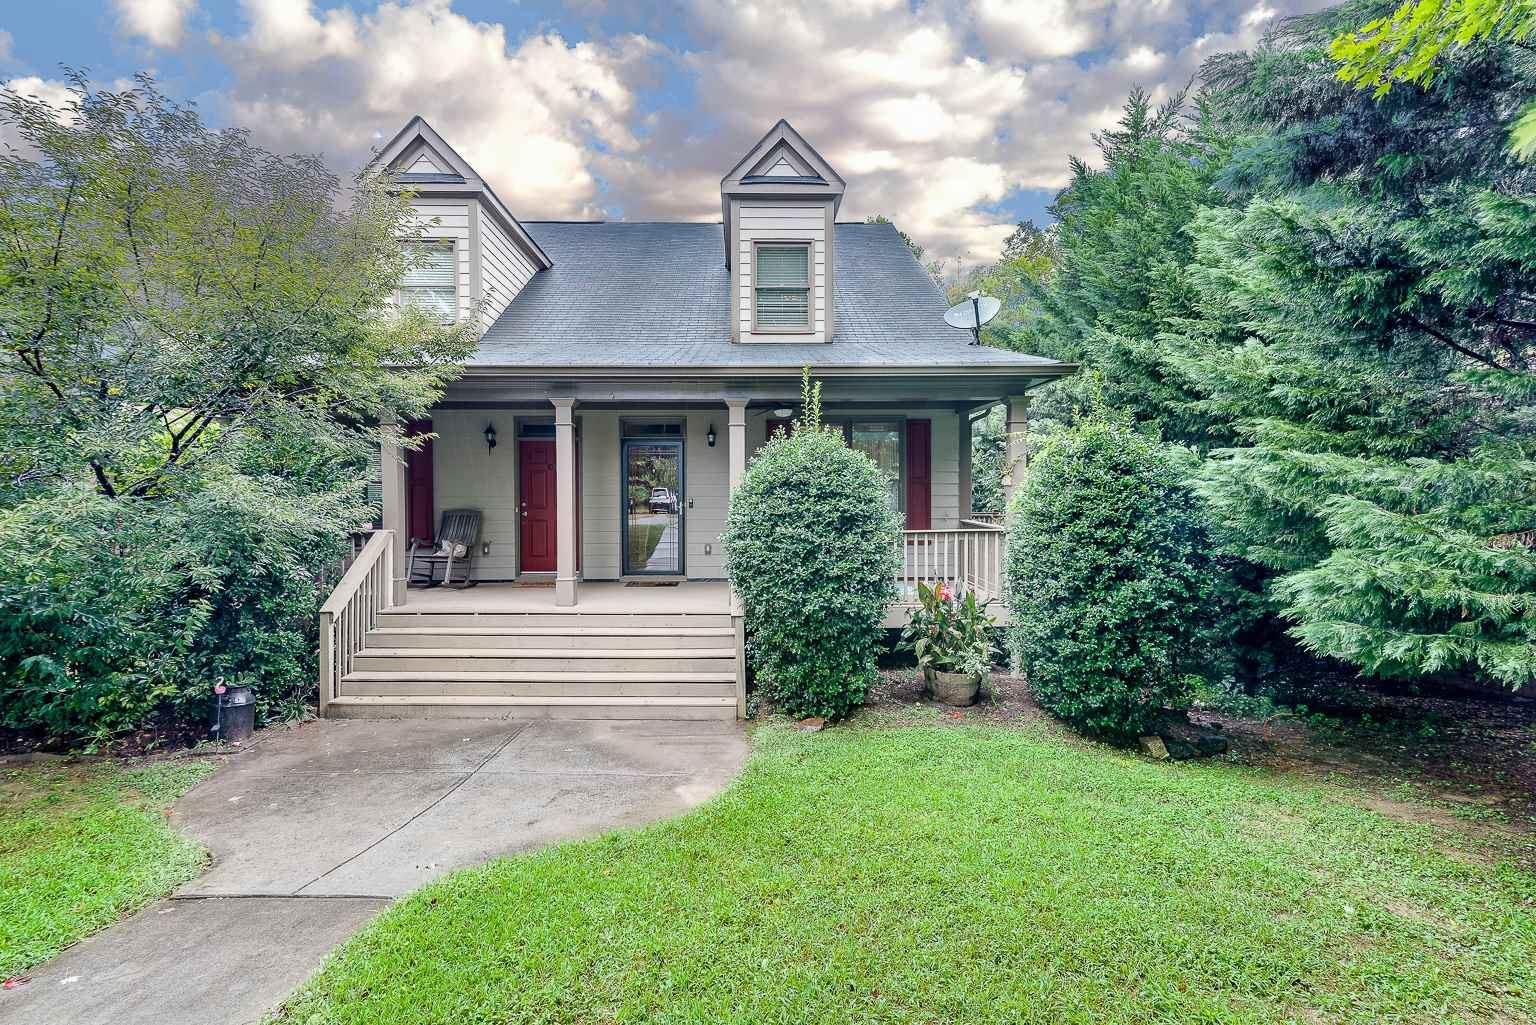 1433 Carroll Dr, Atlanta, GA 30318 - #: 8862197